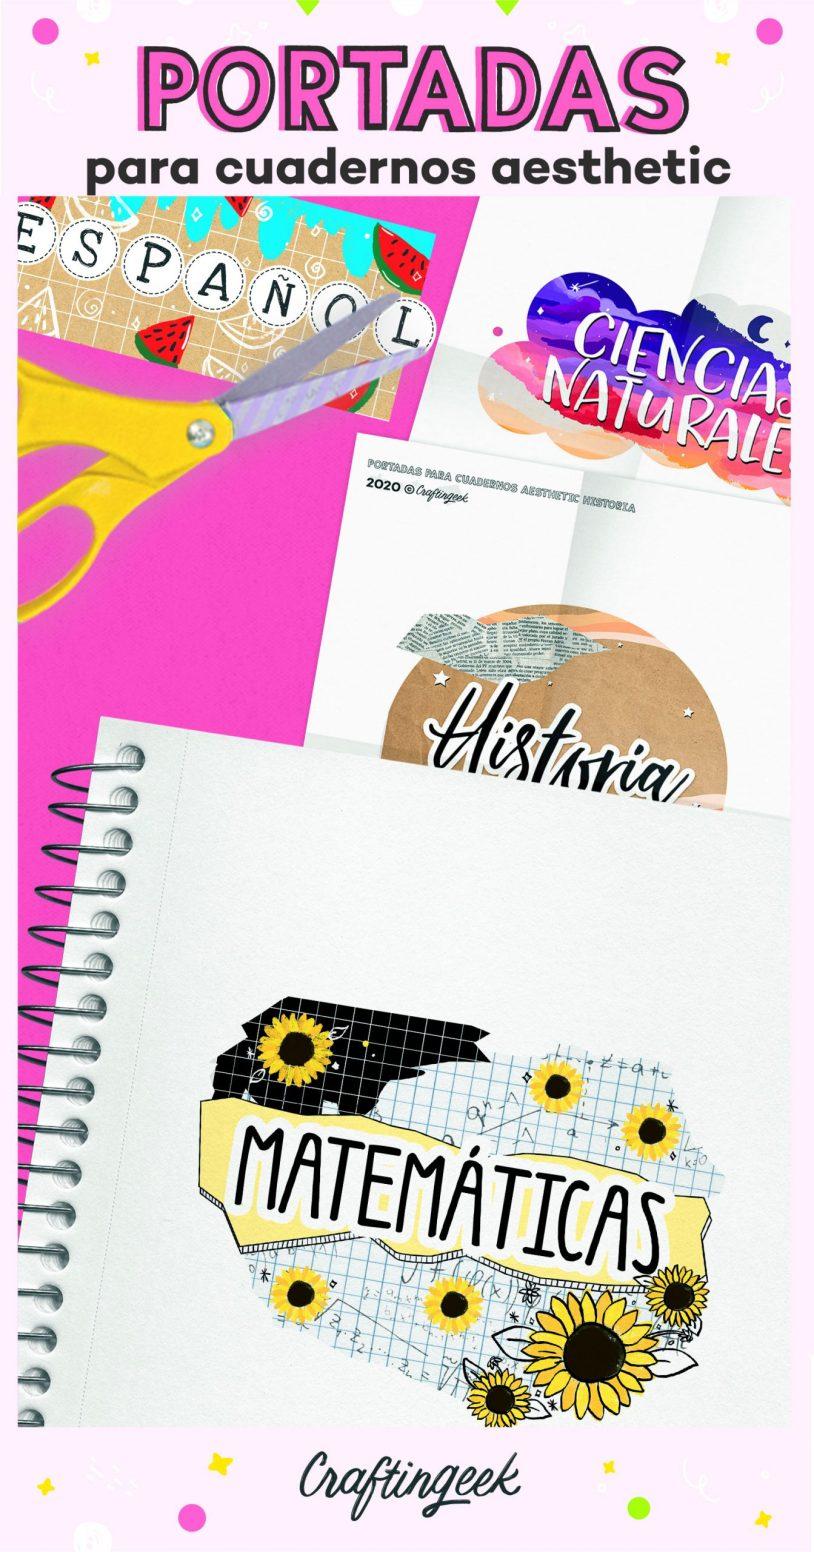 Portadas para cuadernos tumblr_Portada